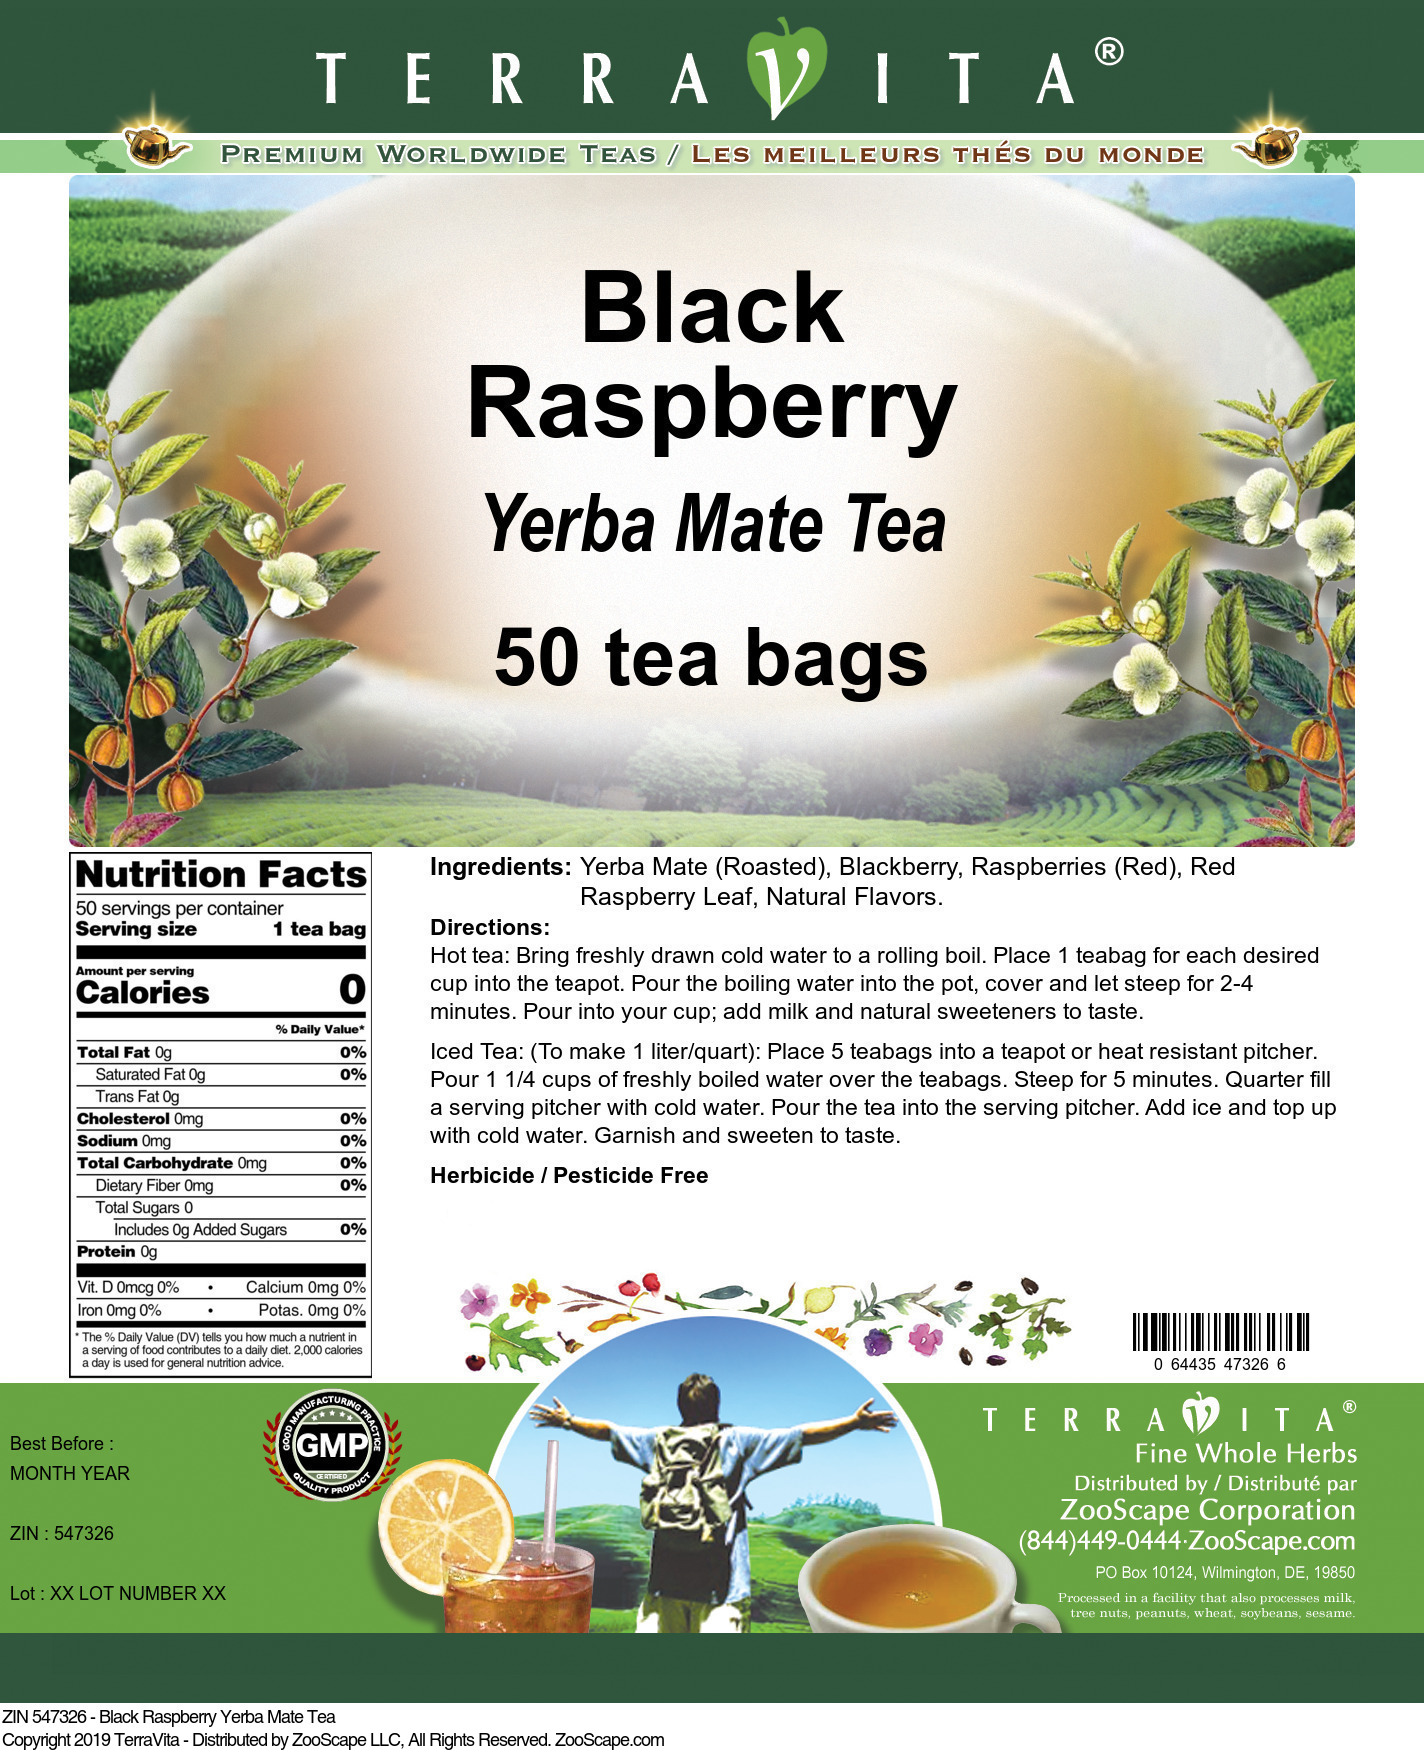 Black Raspberry Yerba Mate